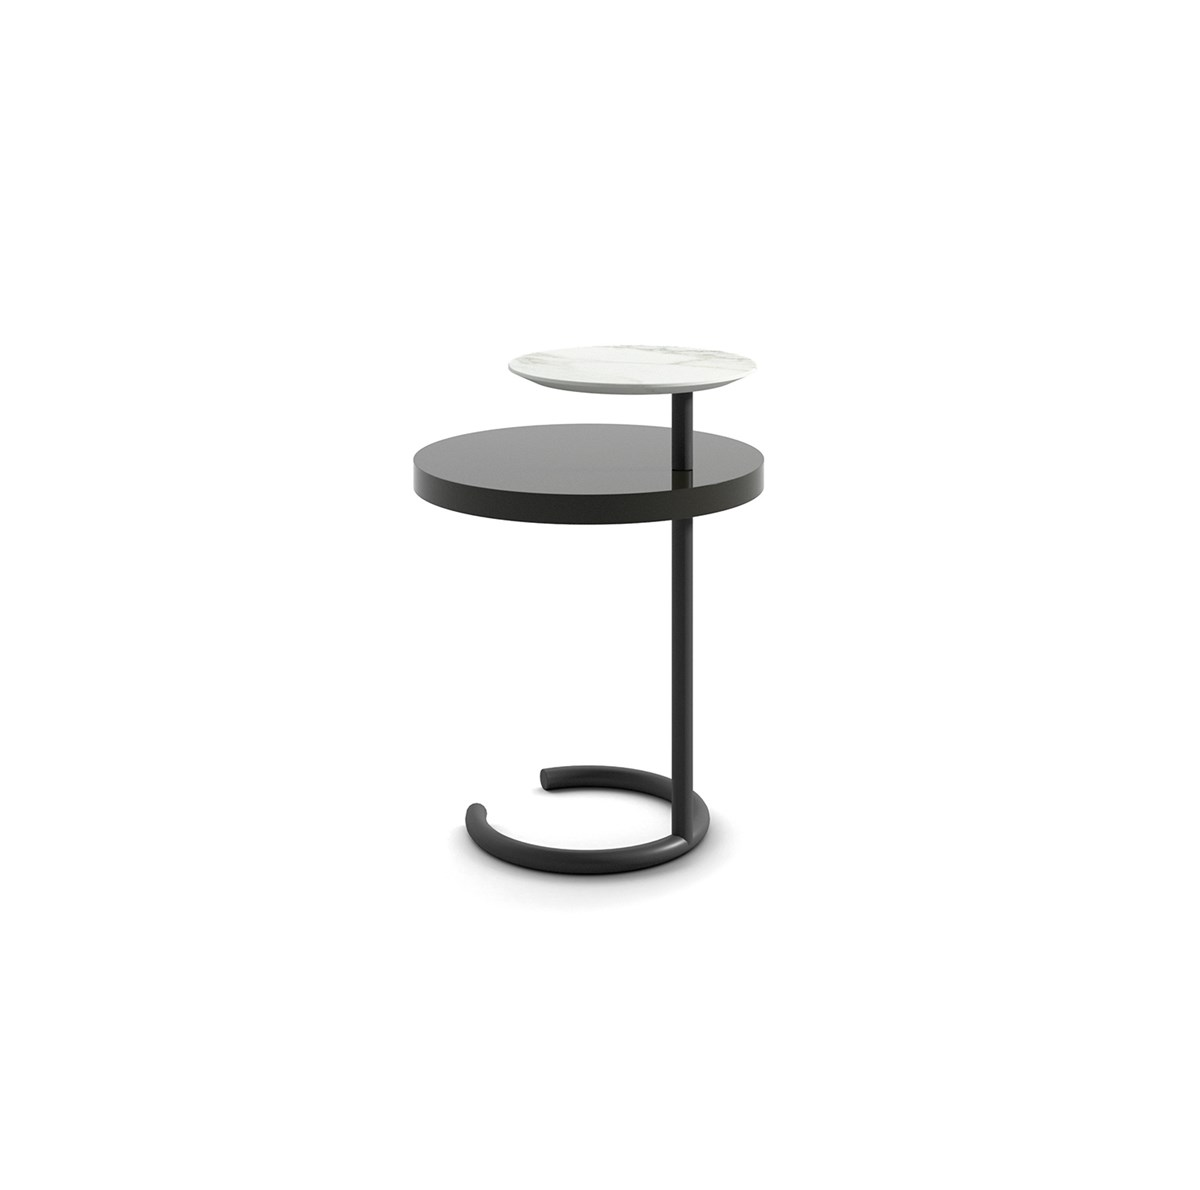 Cassina-Rodolfo-Dordoni-Acute-Side-Table-Matisse-1